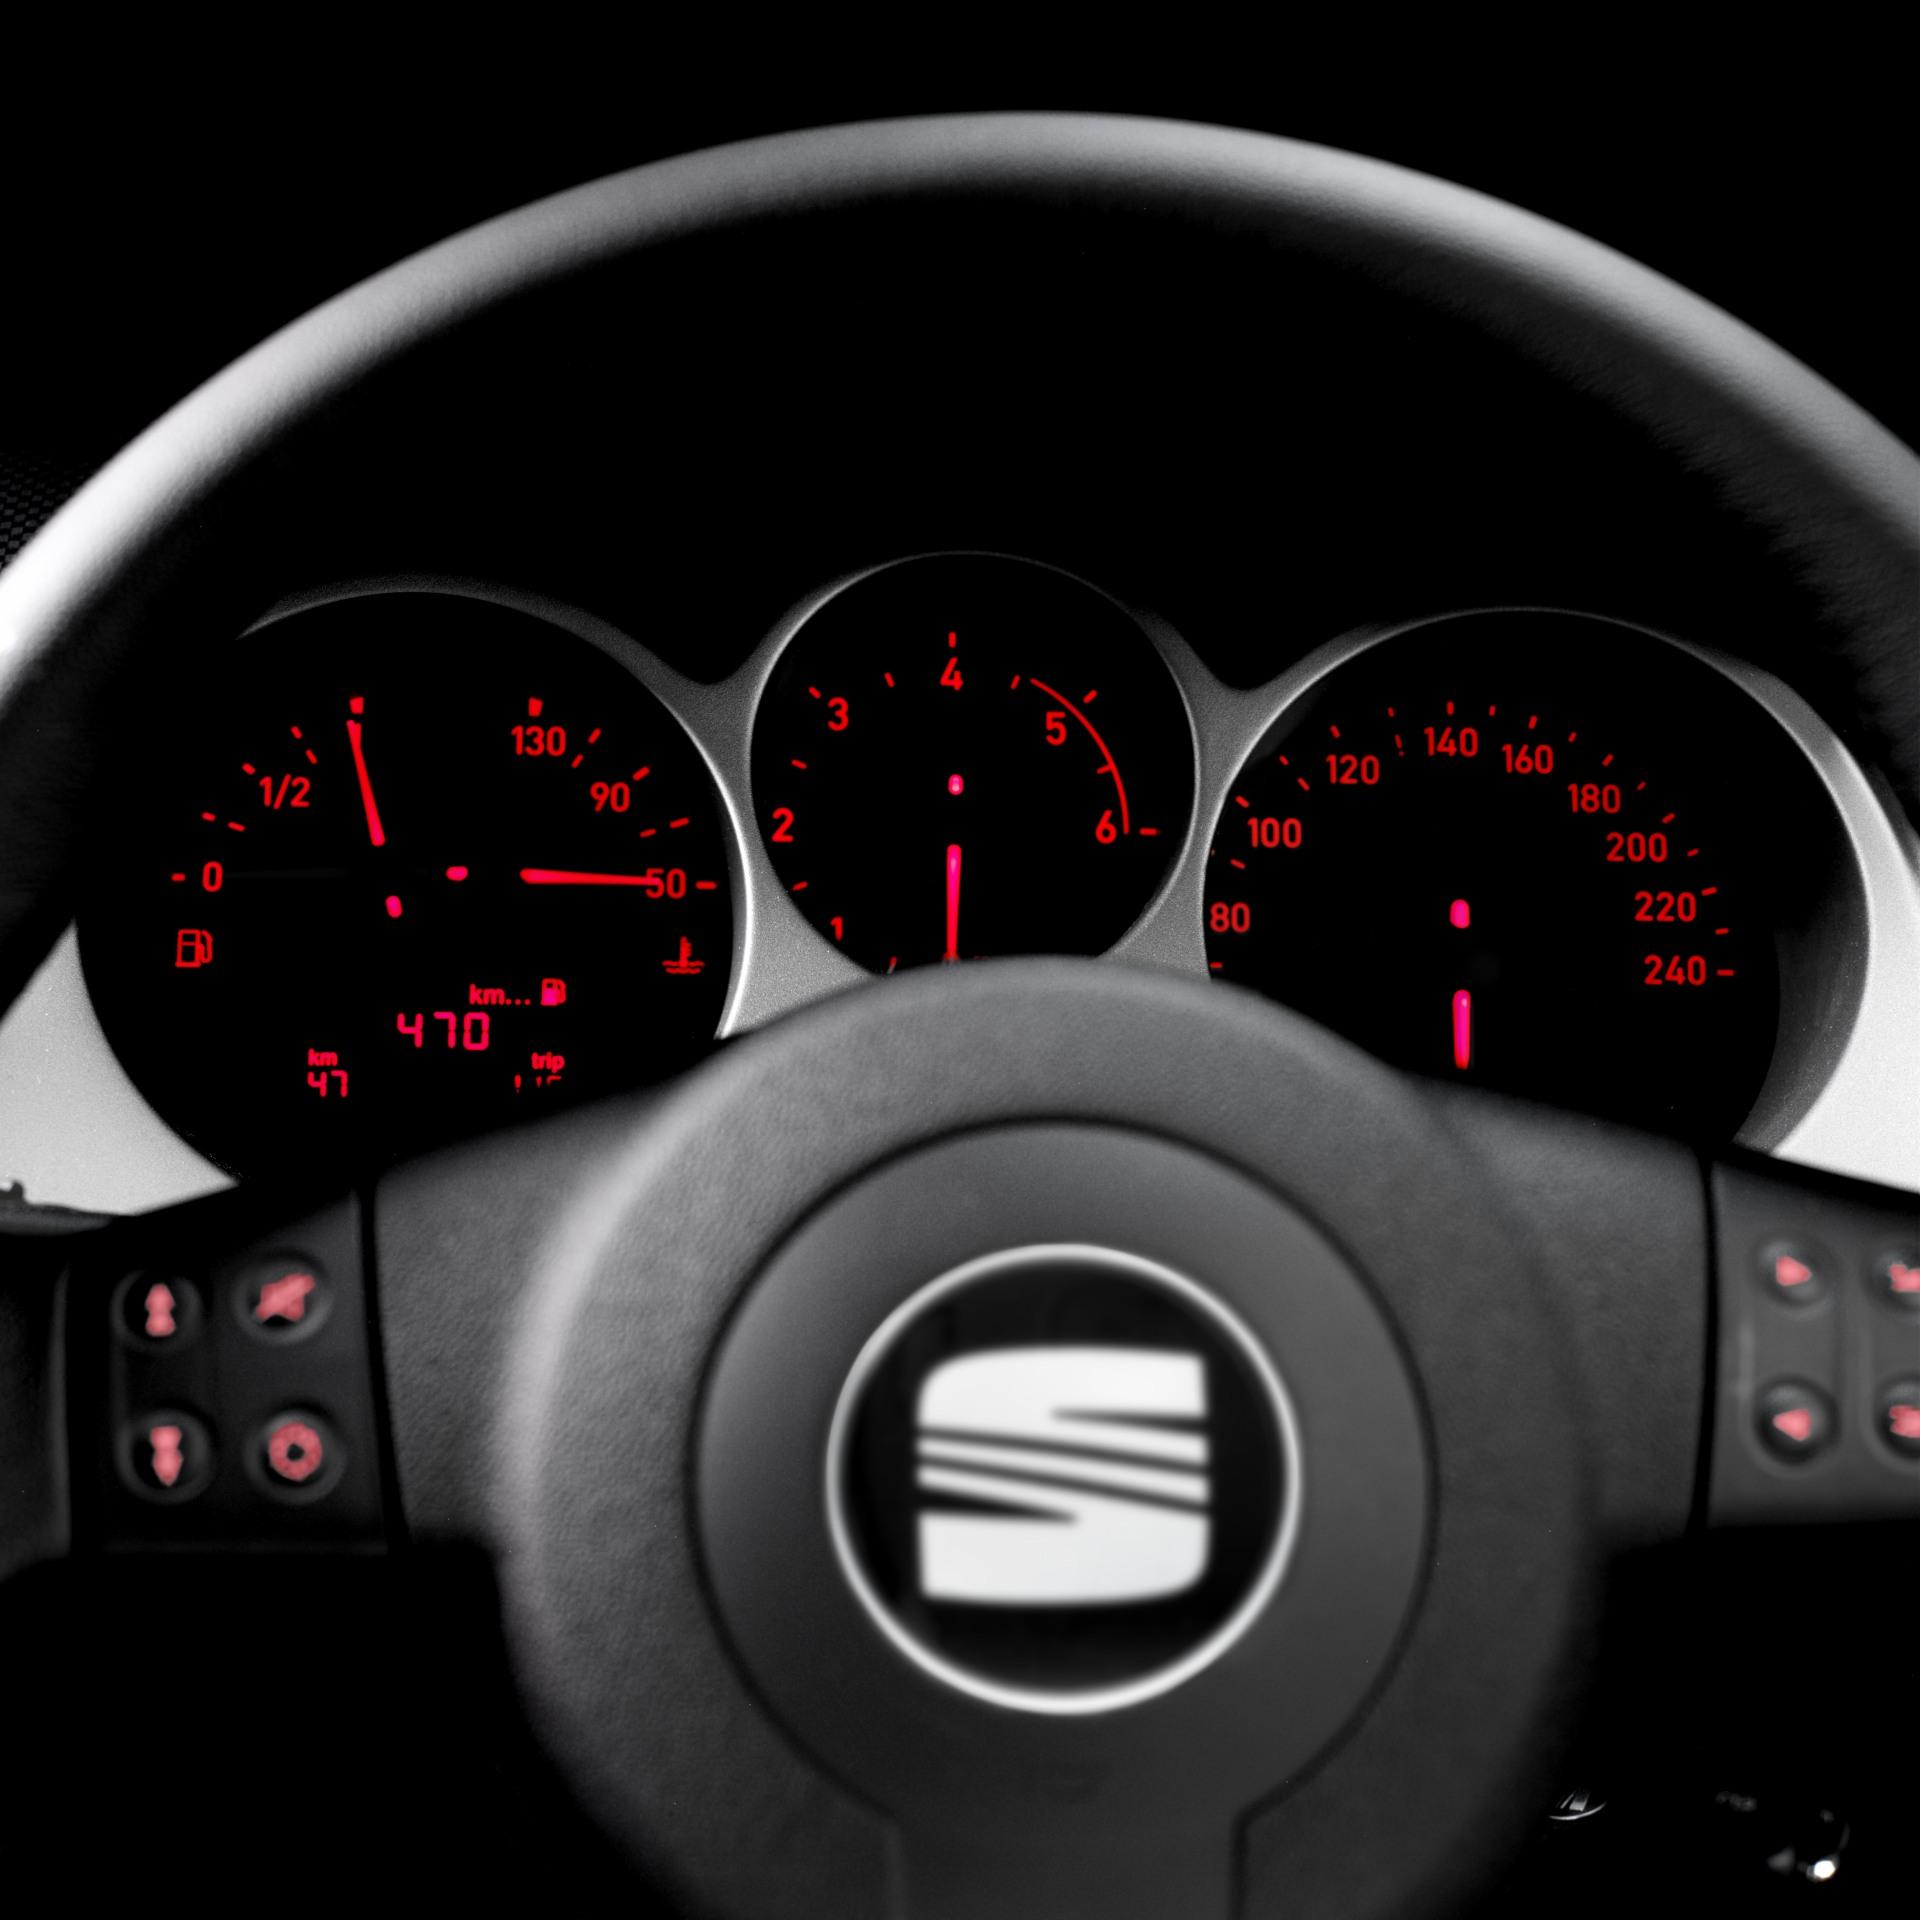 2009 Seat Altea Image. Photo 14 of 65